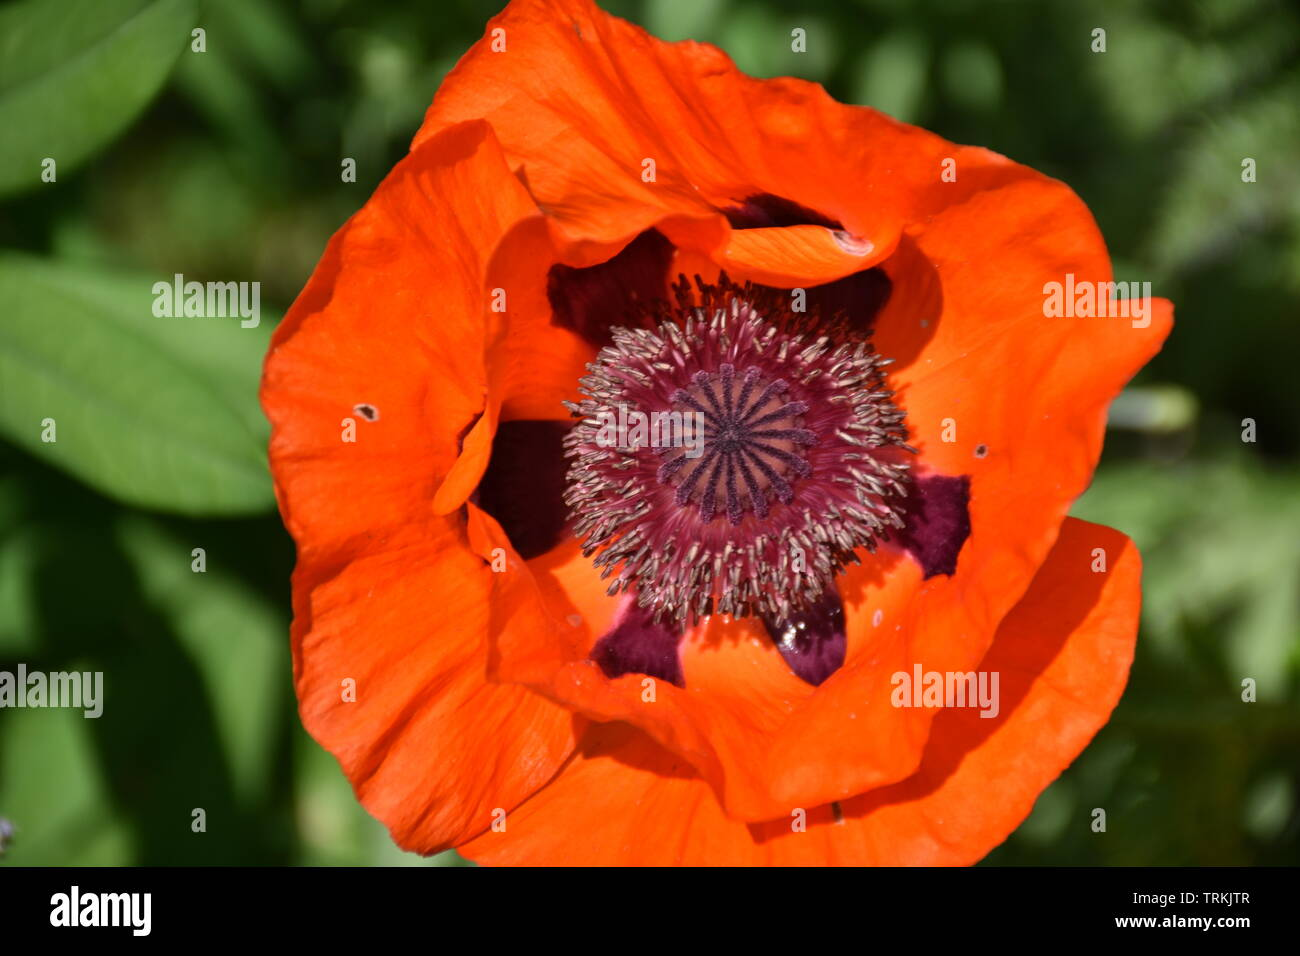 Klatschmohn, Papaver rhoeas, Mohnblume, Klatschrose, Mohn, Kapsel, Blüte, Sommer, blühen, Blume, aufblühen, verblühen, Blütenblatt, rot, Sommer, Jahre - Stock Image